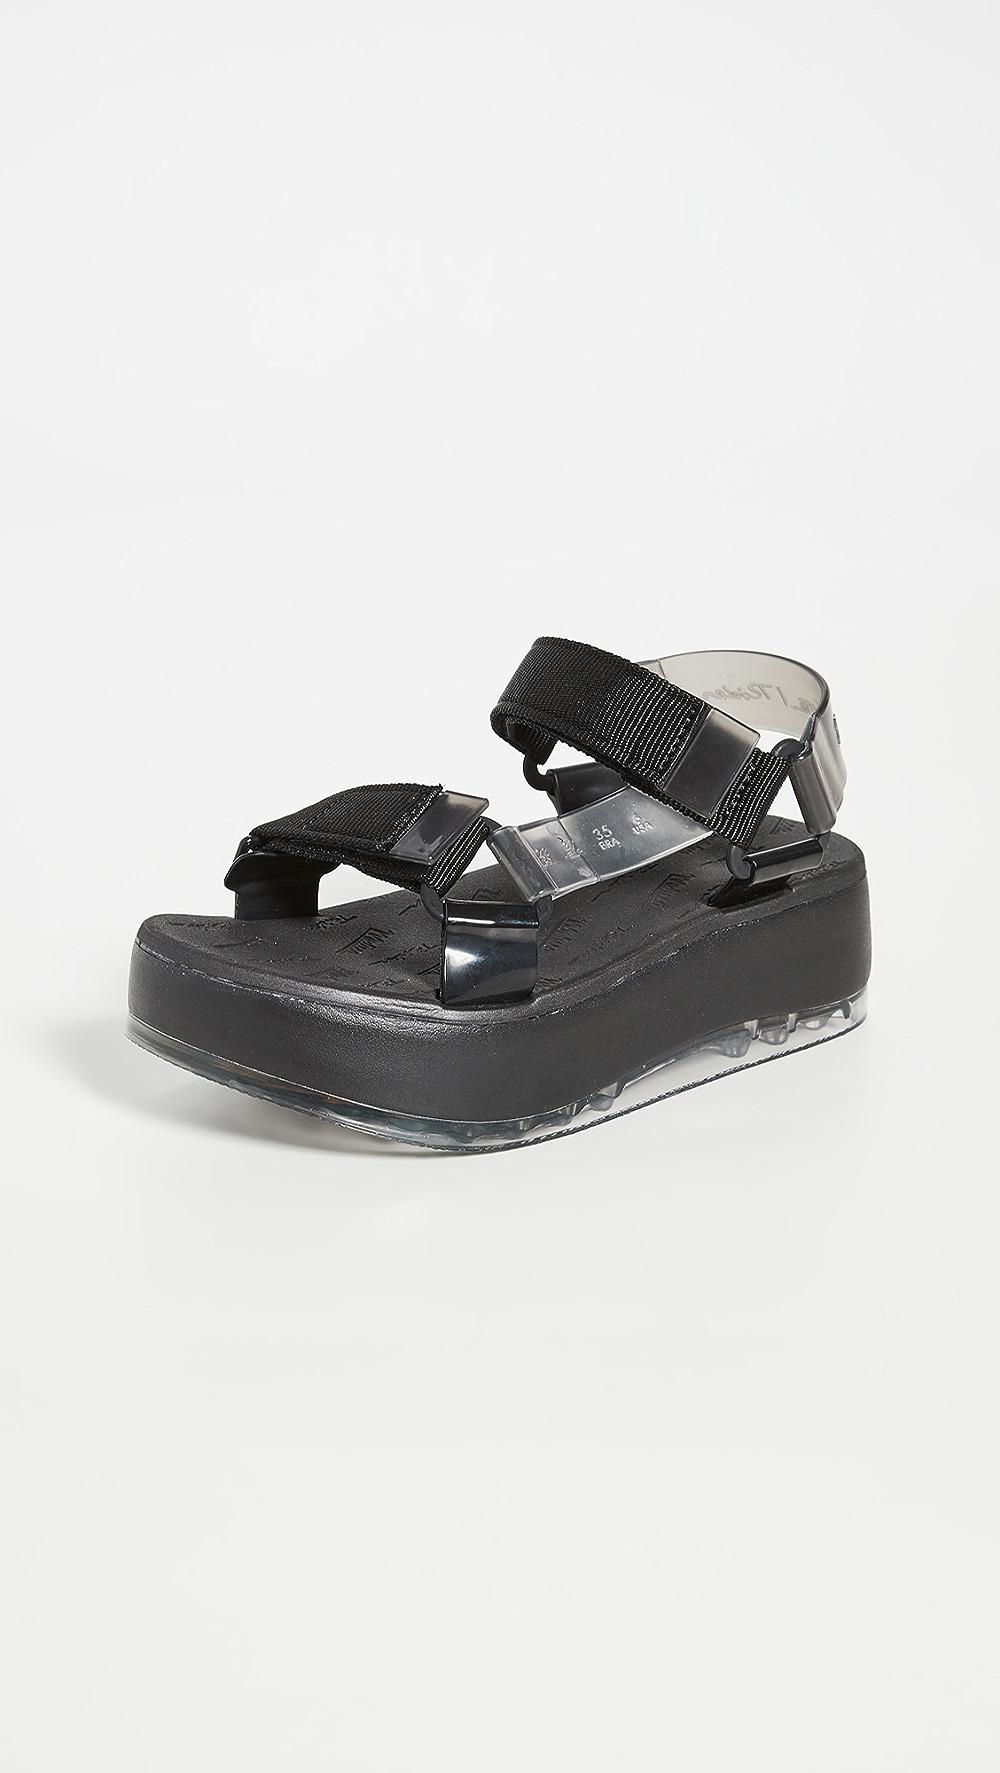 Aggressive Melissa - Melissa Papete Platform Sandals Lovely Luster